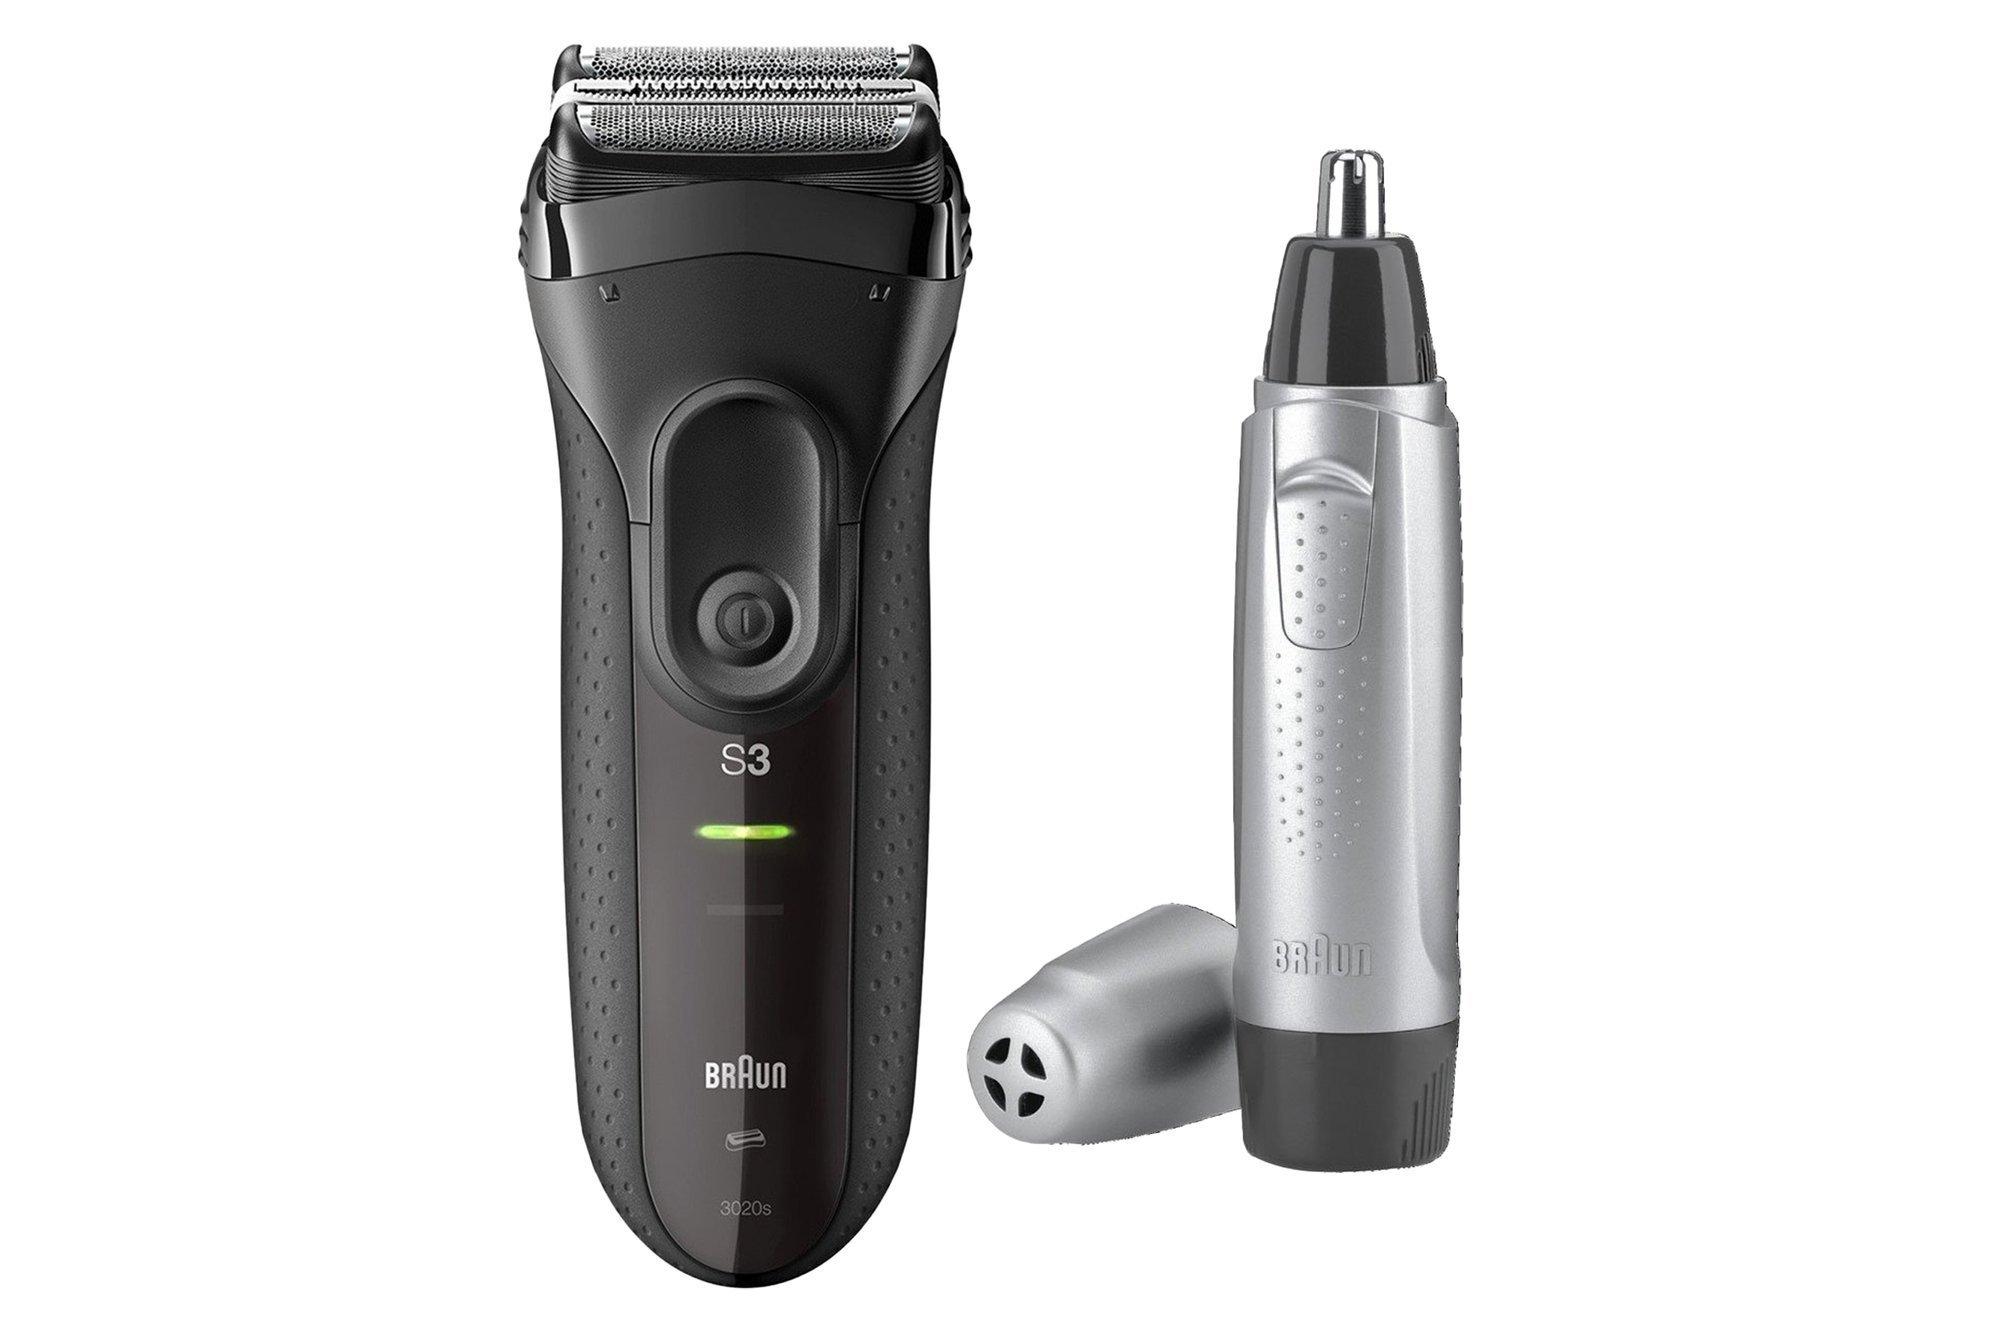 New Braun Series 3 ProSkin Shaver 3000VS + Ear and nose trimmer EN10